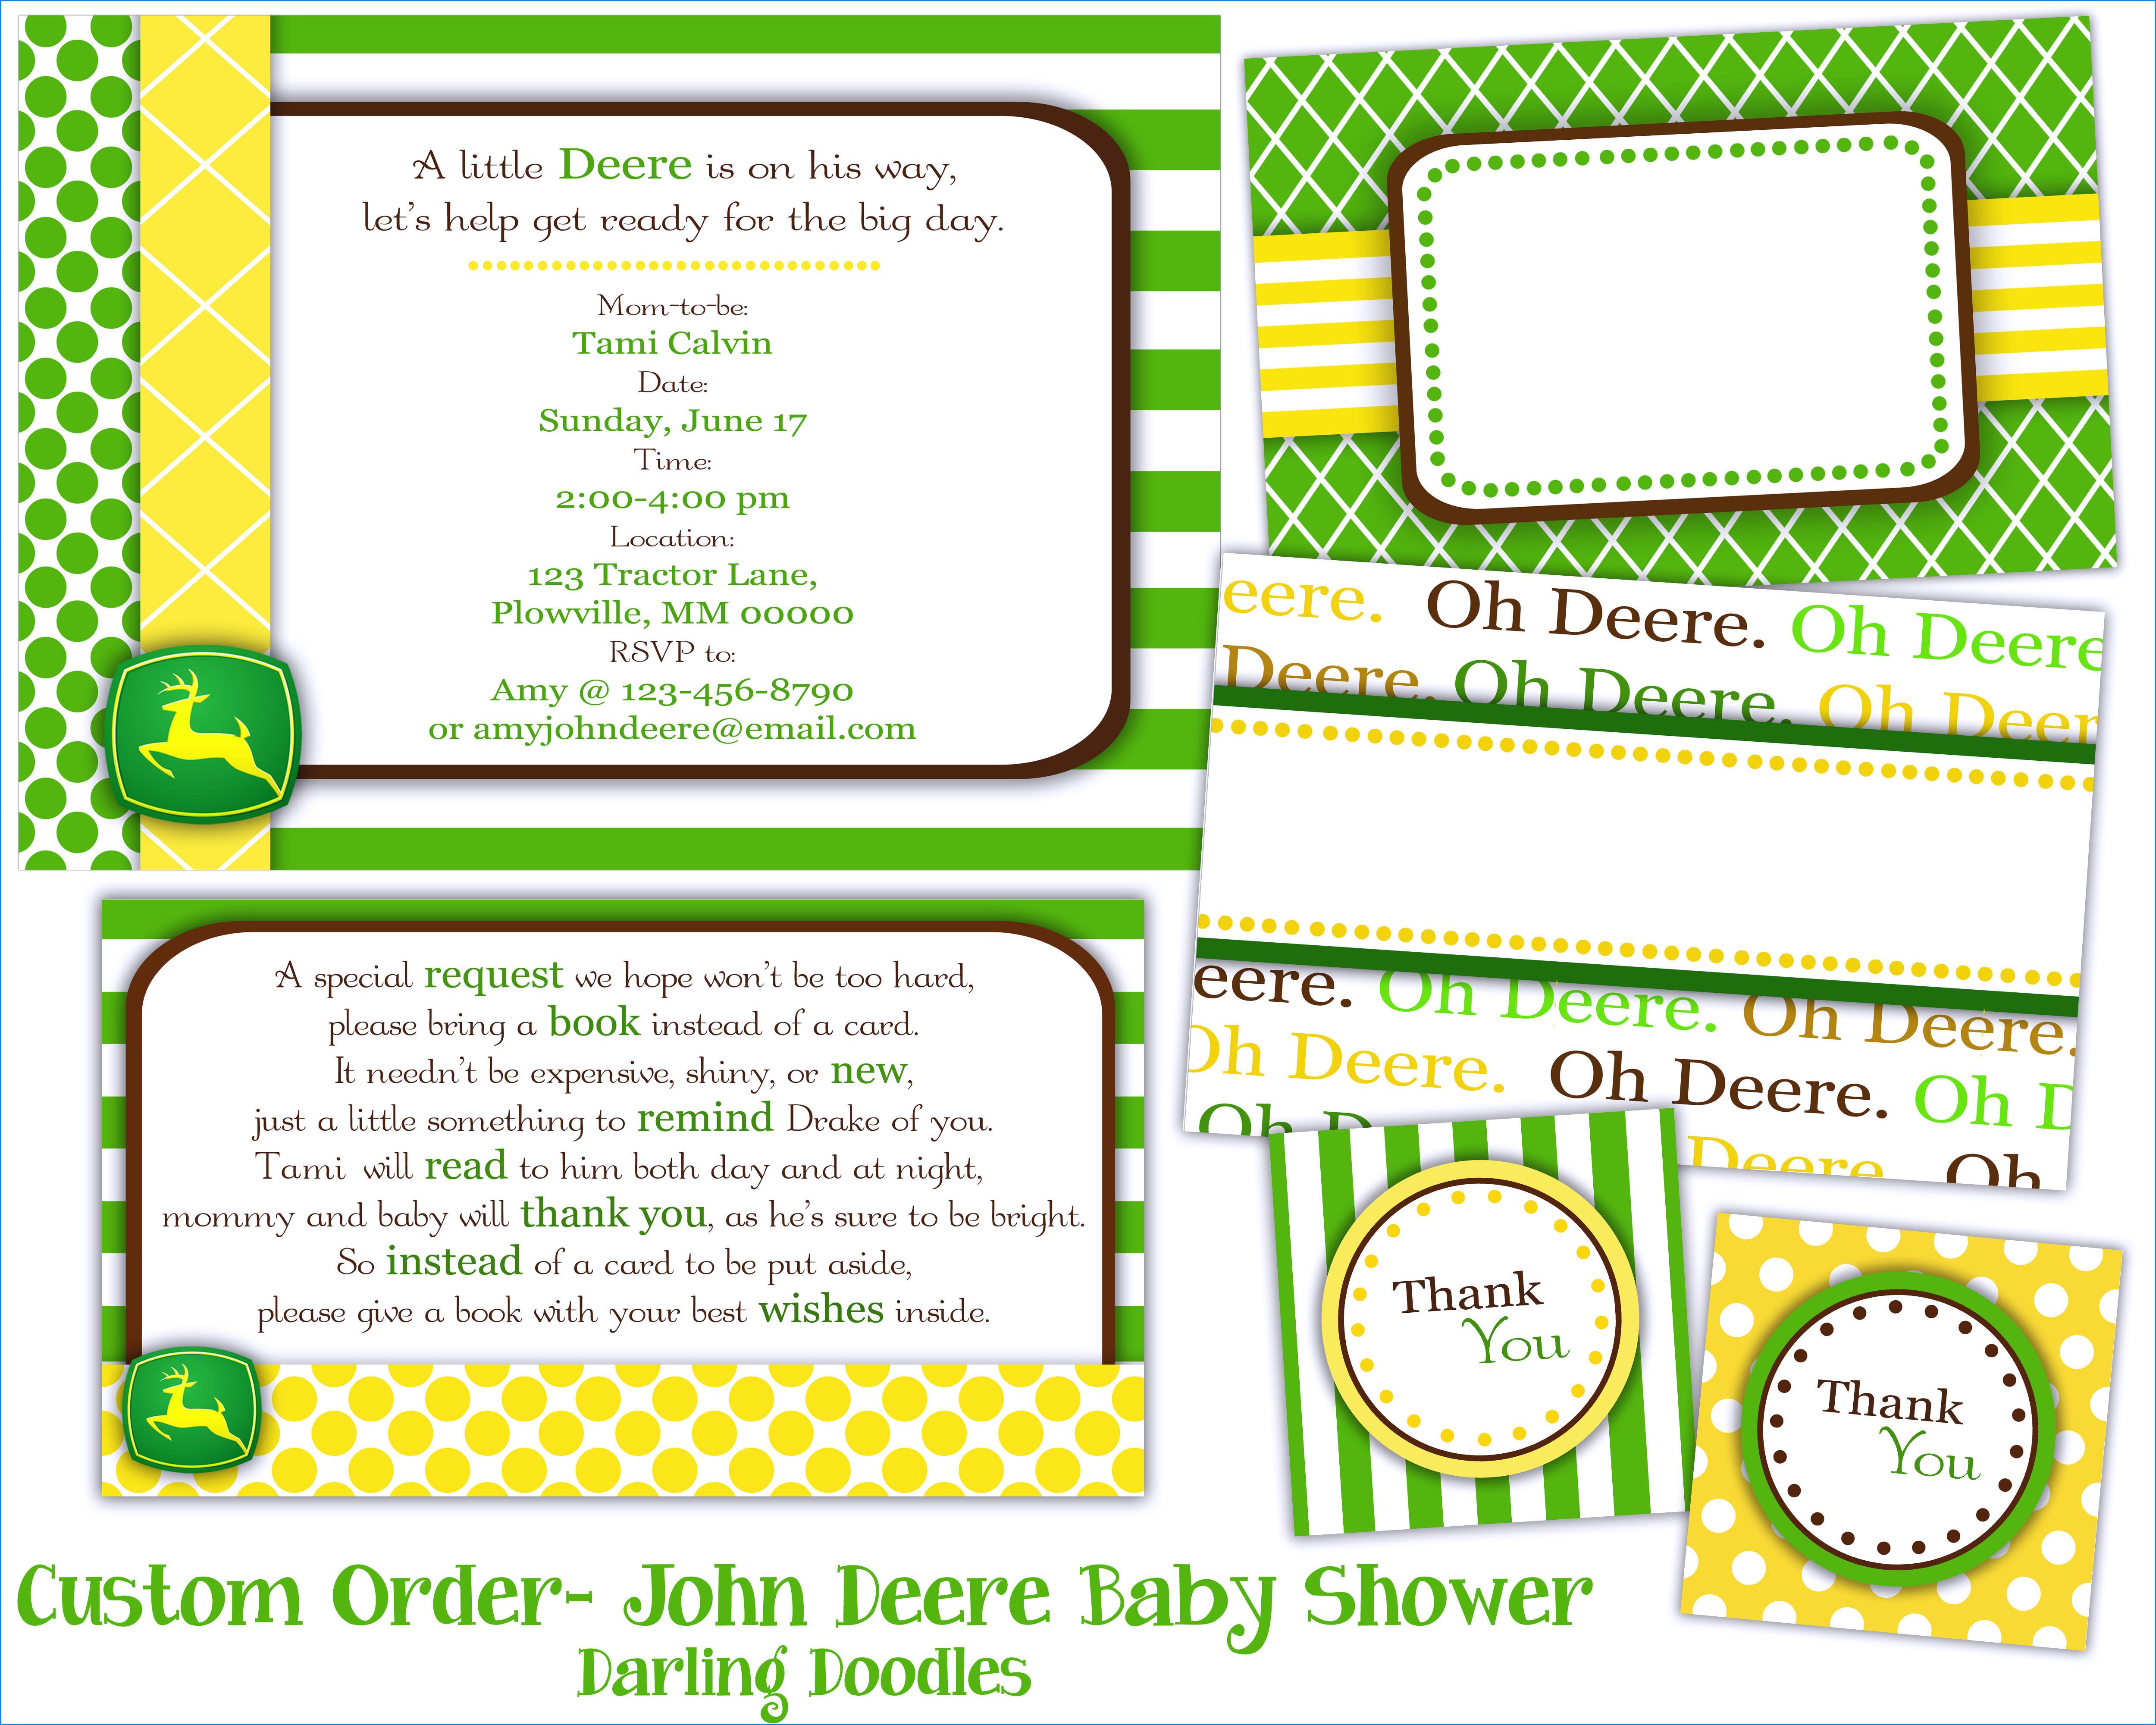 John Deere Birthday Invitations Luxury John Deere Birthday - Free Printable John Deere Birthday Invitations